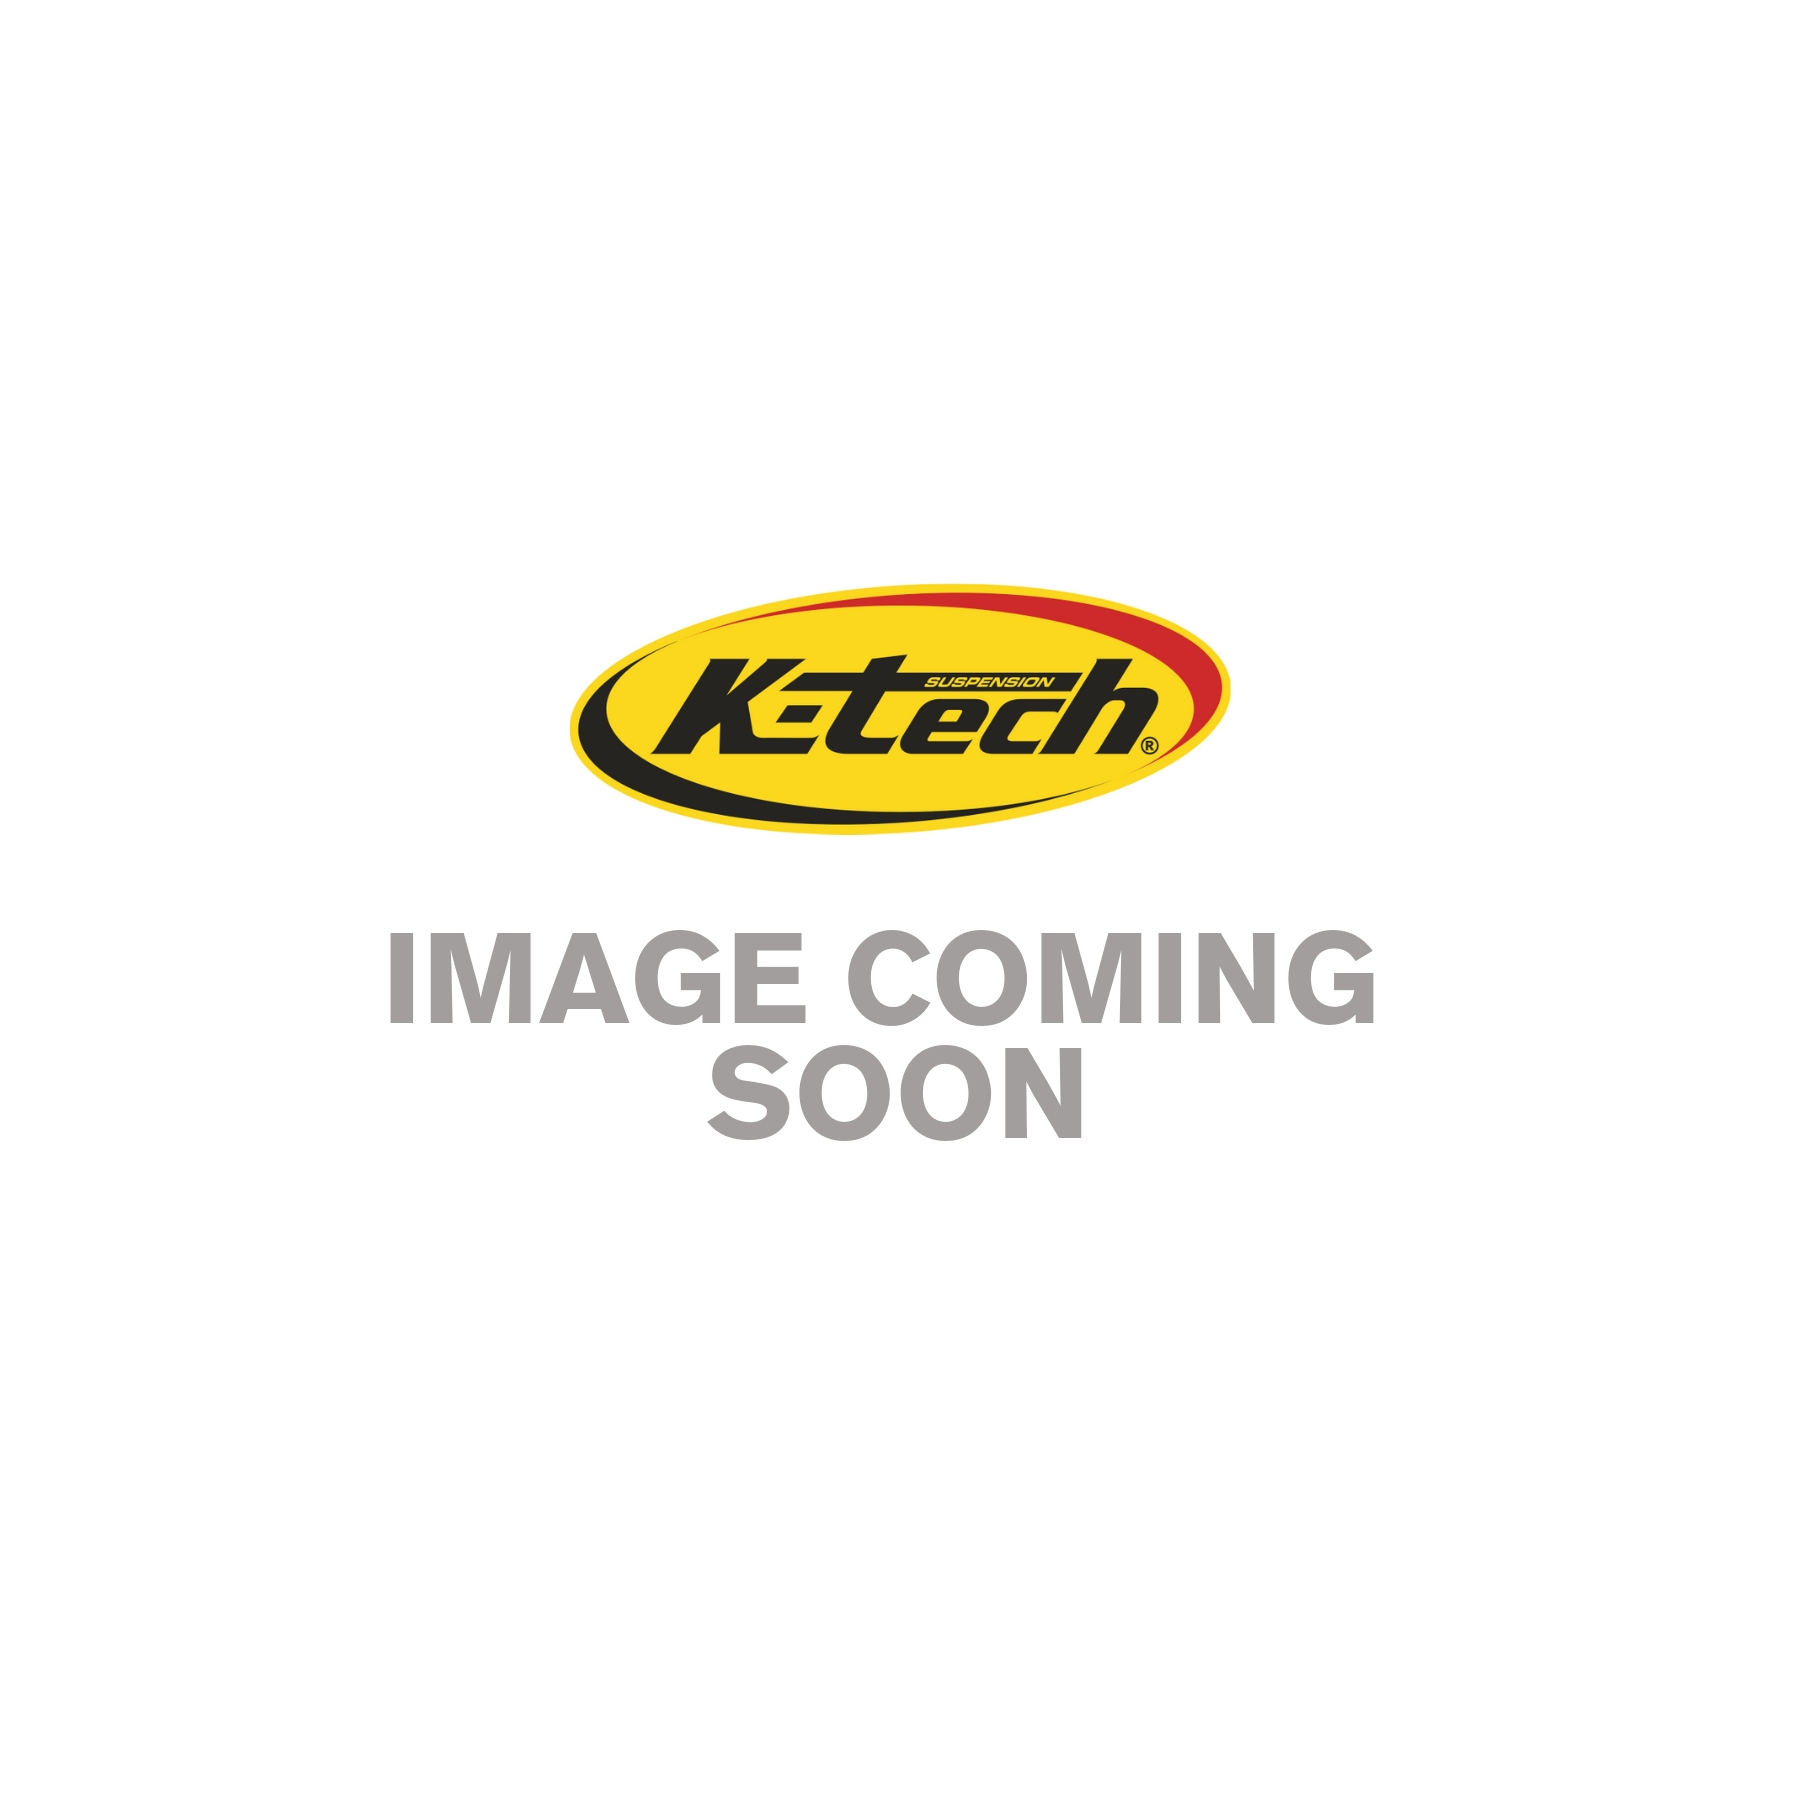 Shock Absorber Seperation Piston Drive -Bullit